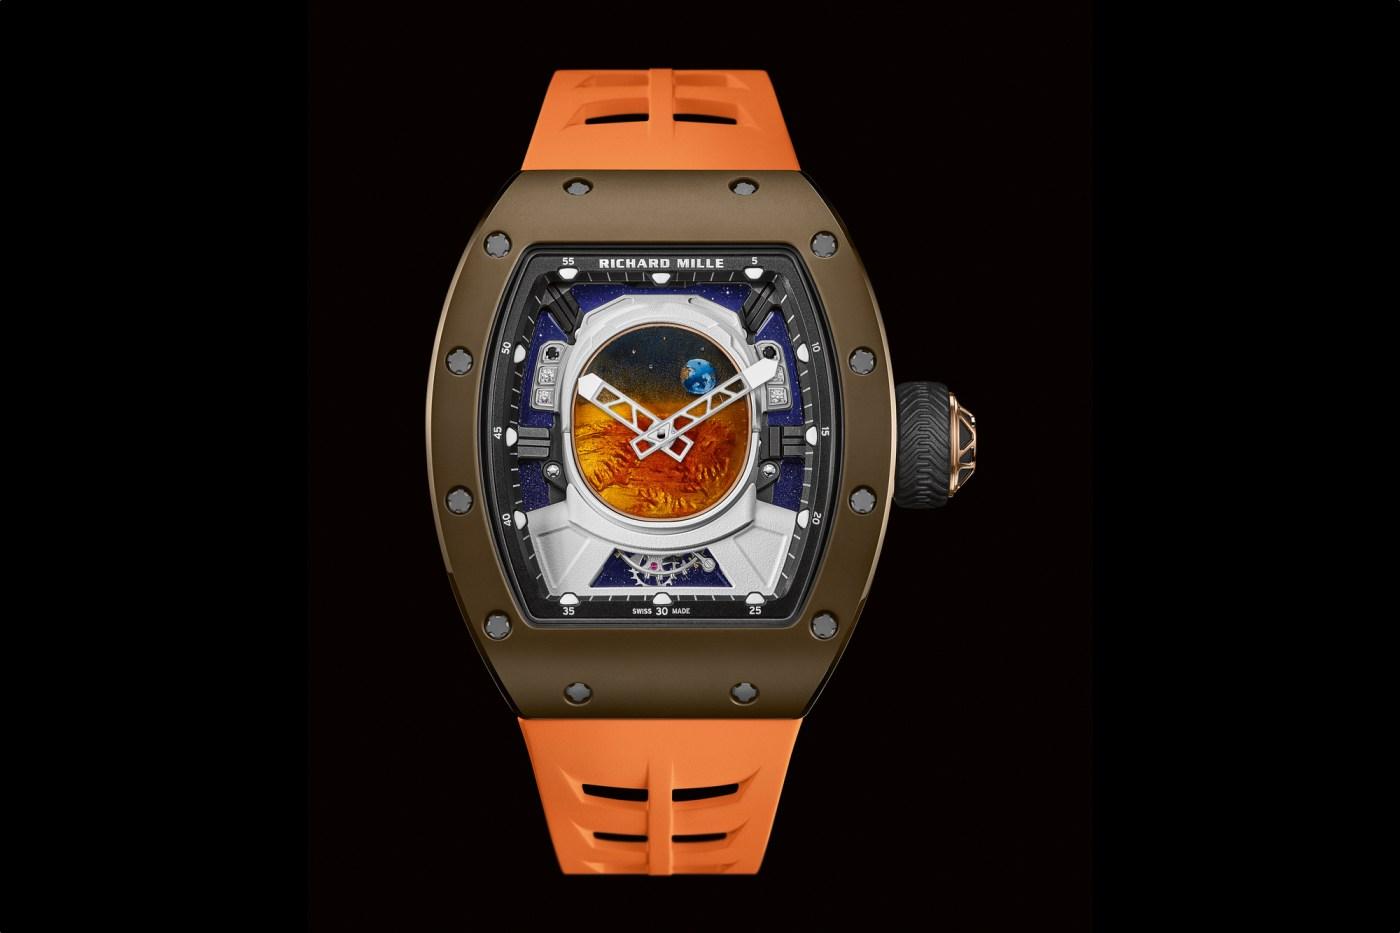 Richard Mille x Pharrell Williams RM 52-05